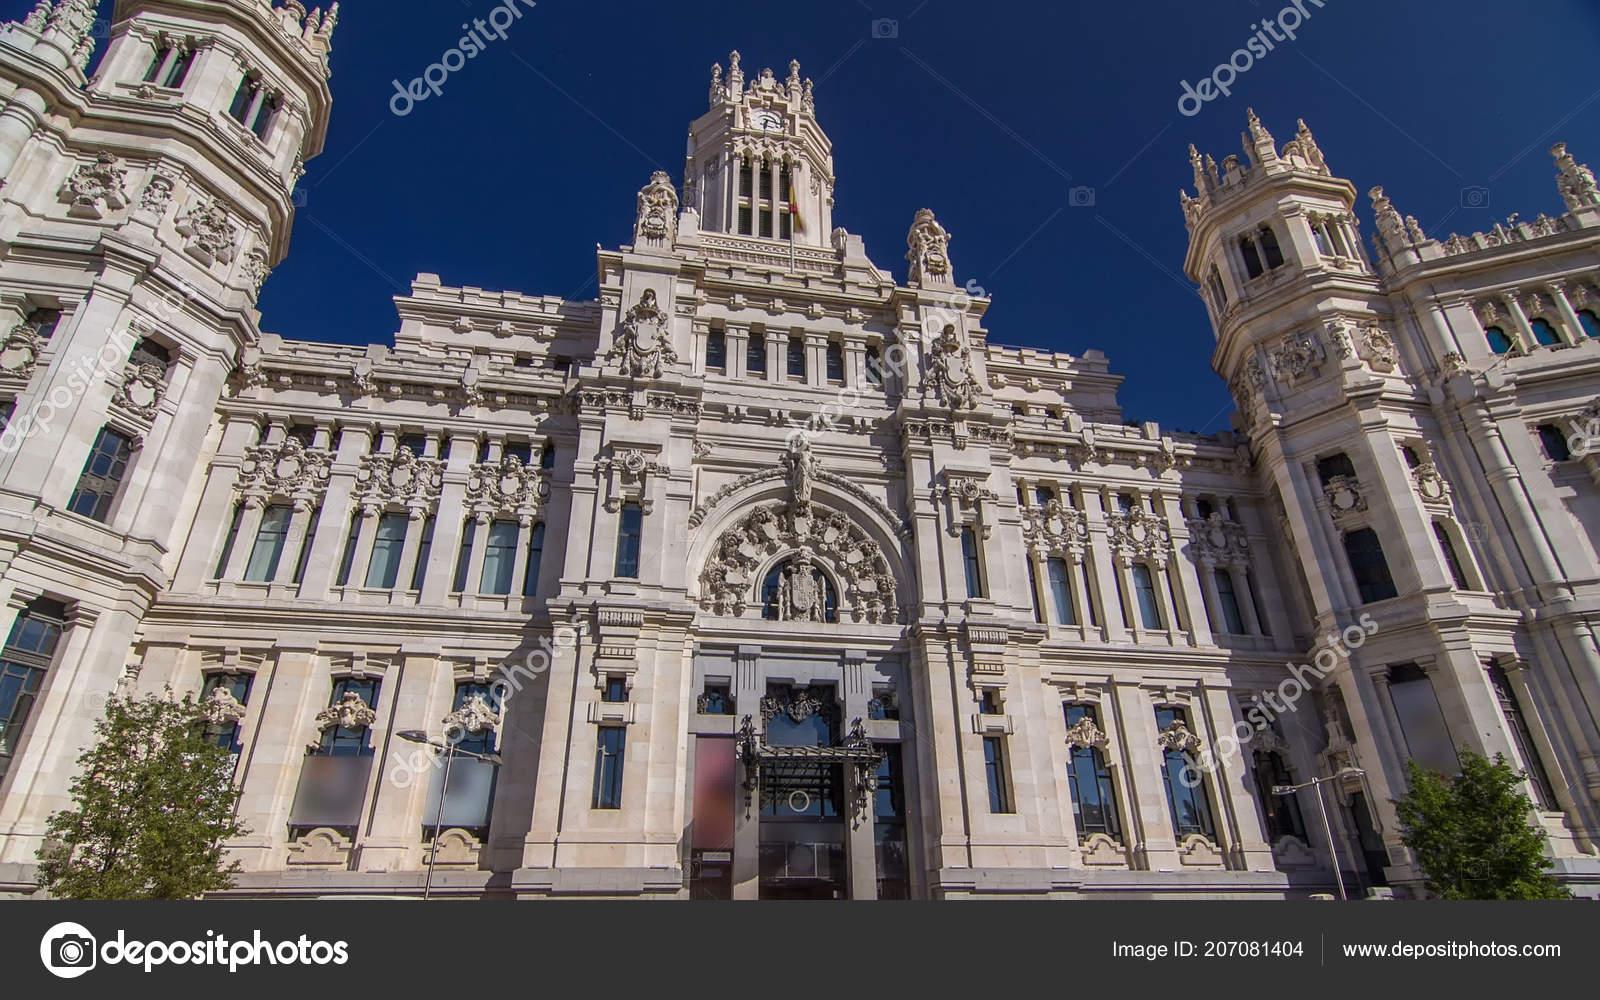 Hyperlapse Timelapse Cibeles Palace Palacio Cibeles Câmara